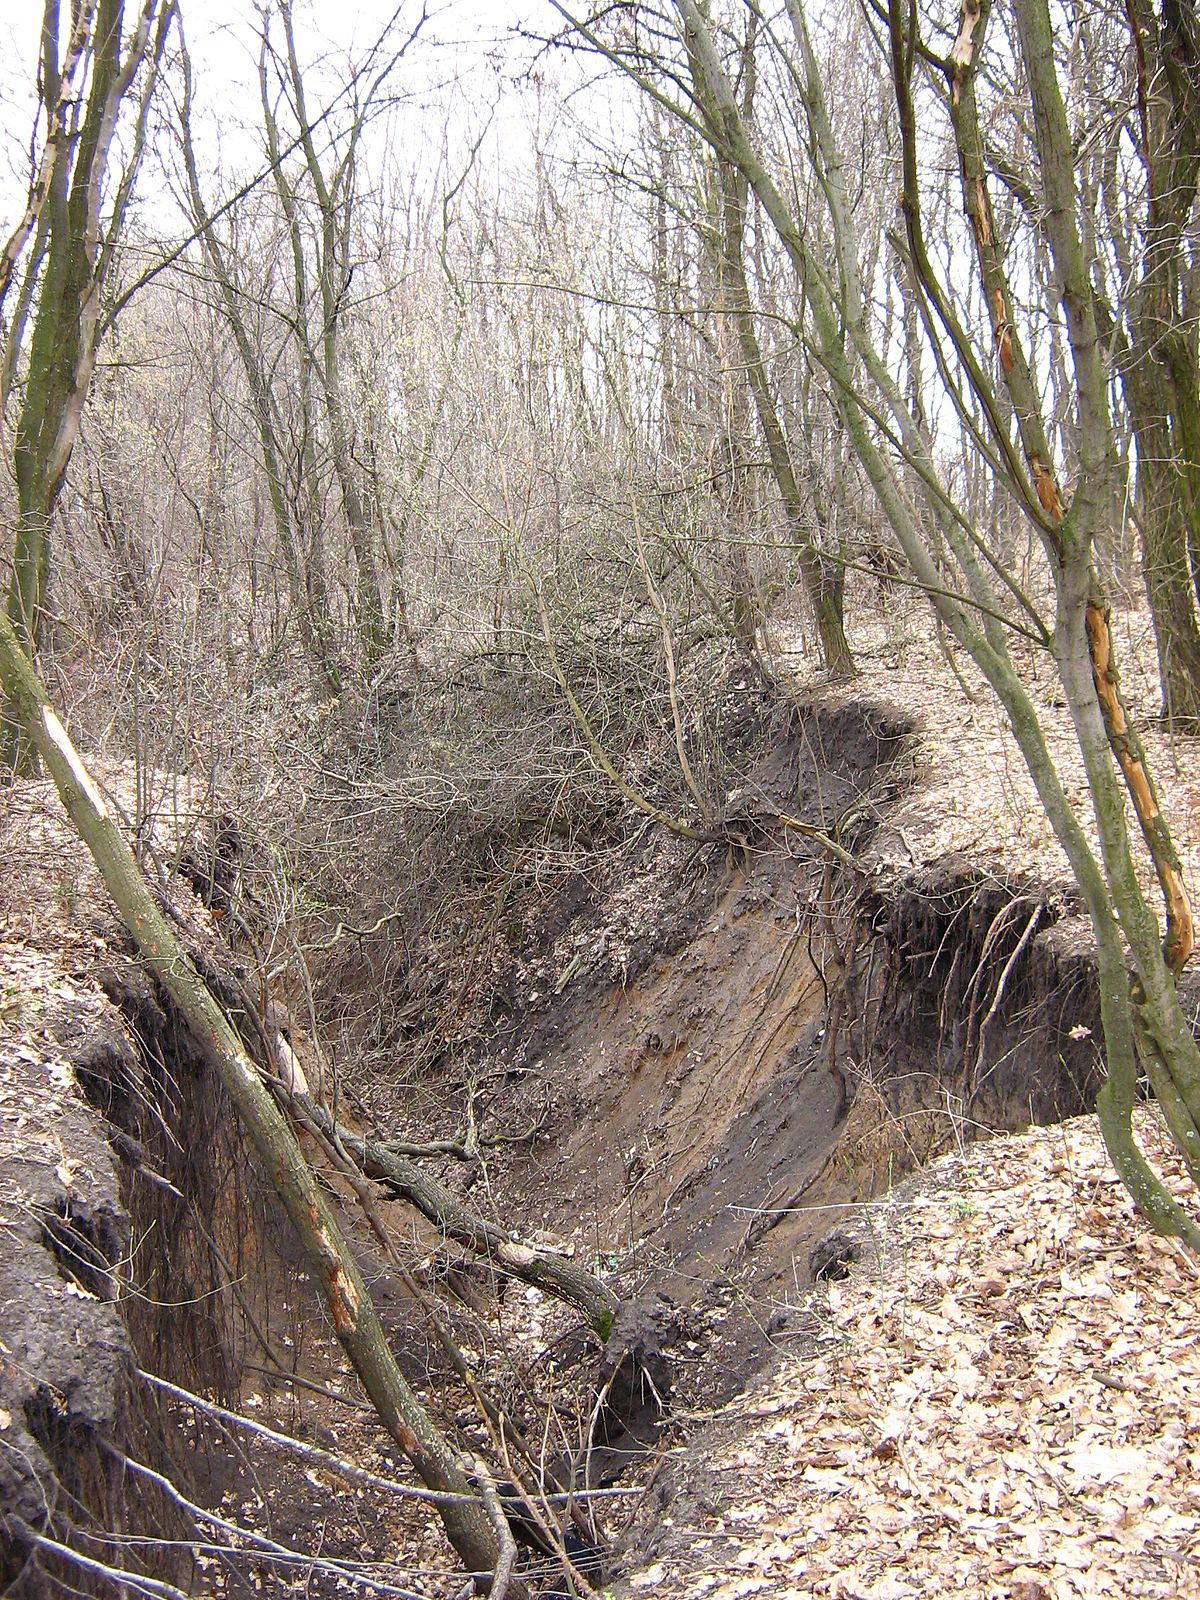 Erosion simple english wikipedia the free encyclopedia for Rocks and soil wikipedia